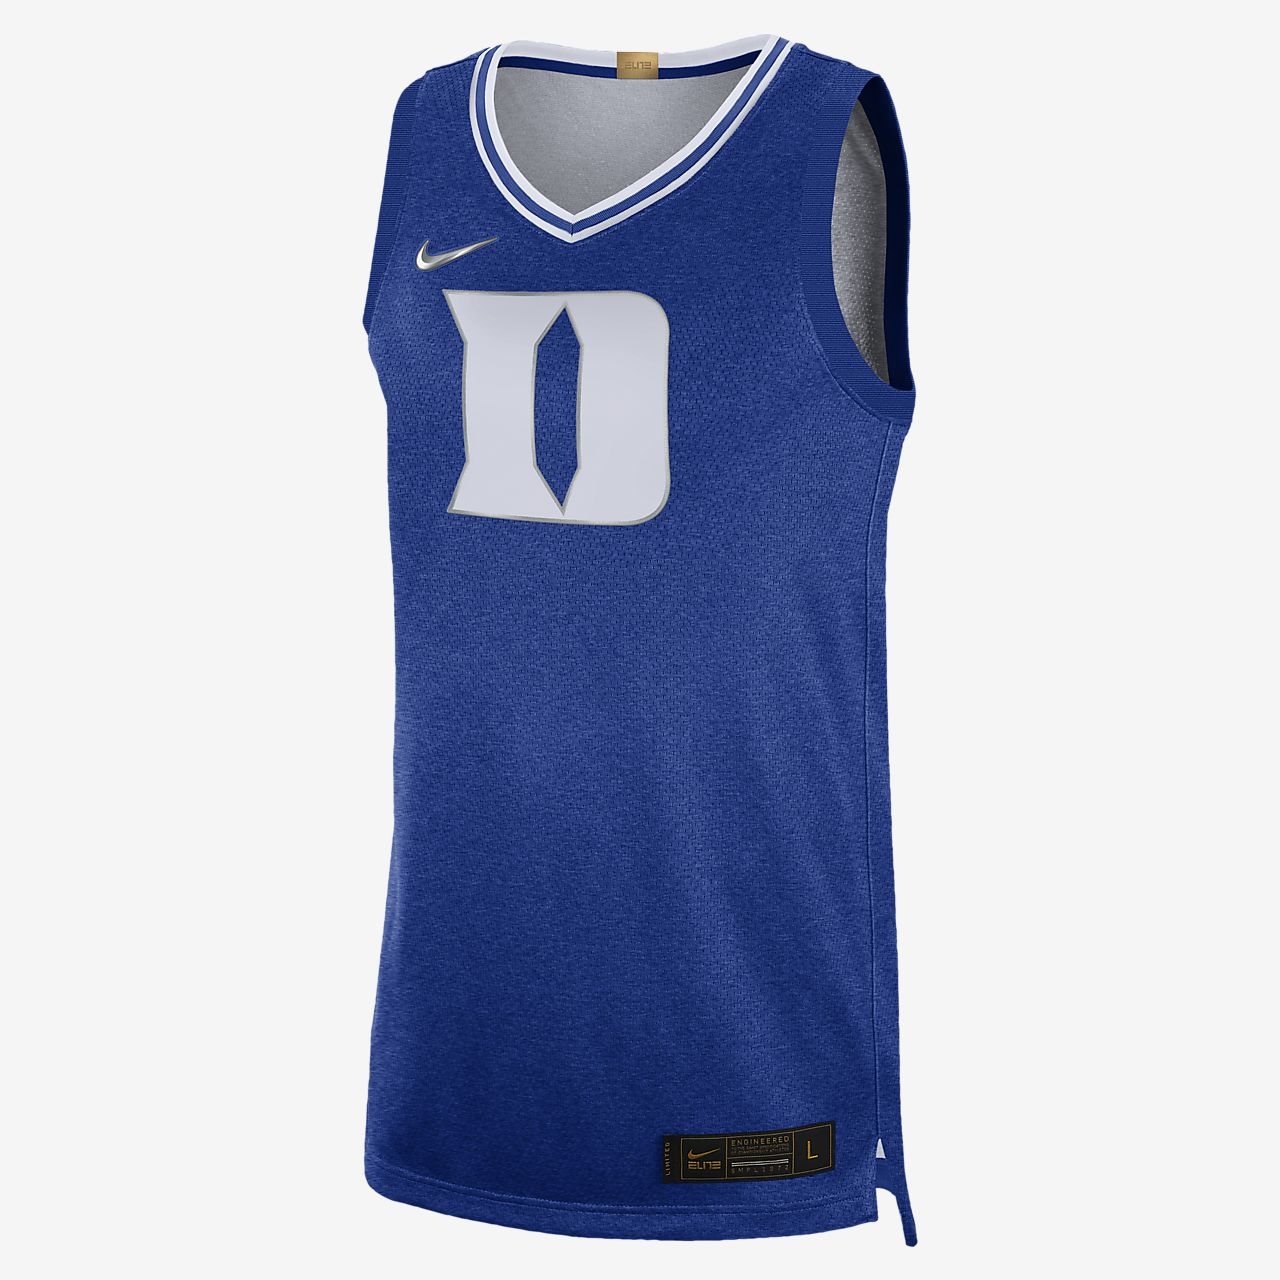 Nike College (Duke) Men's Limited Basketball Jersey